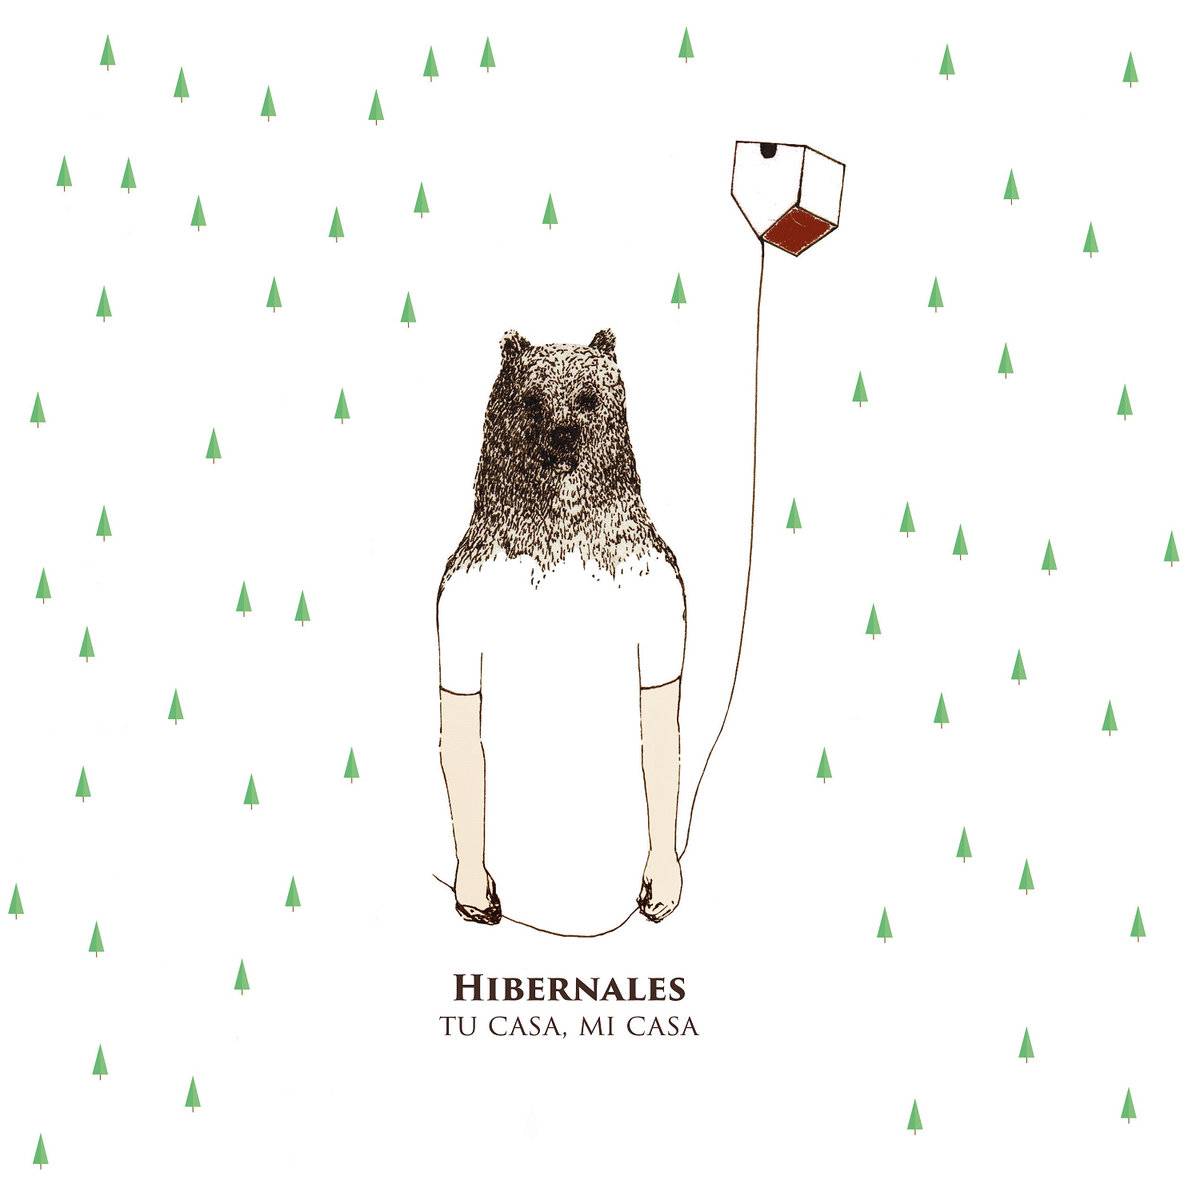 by hibernales